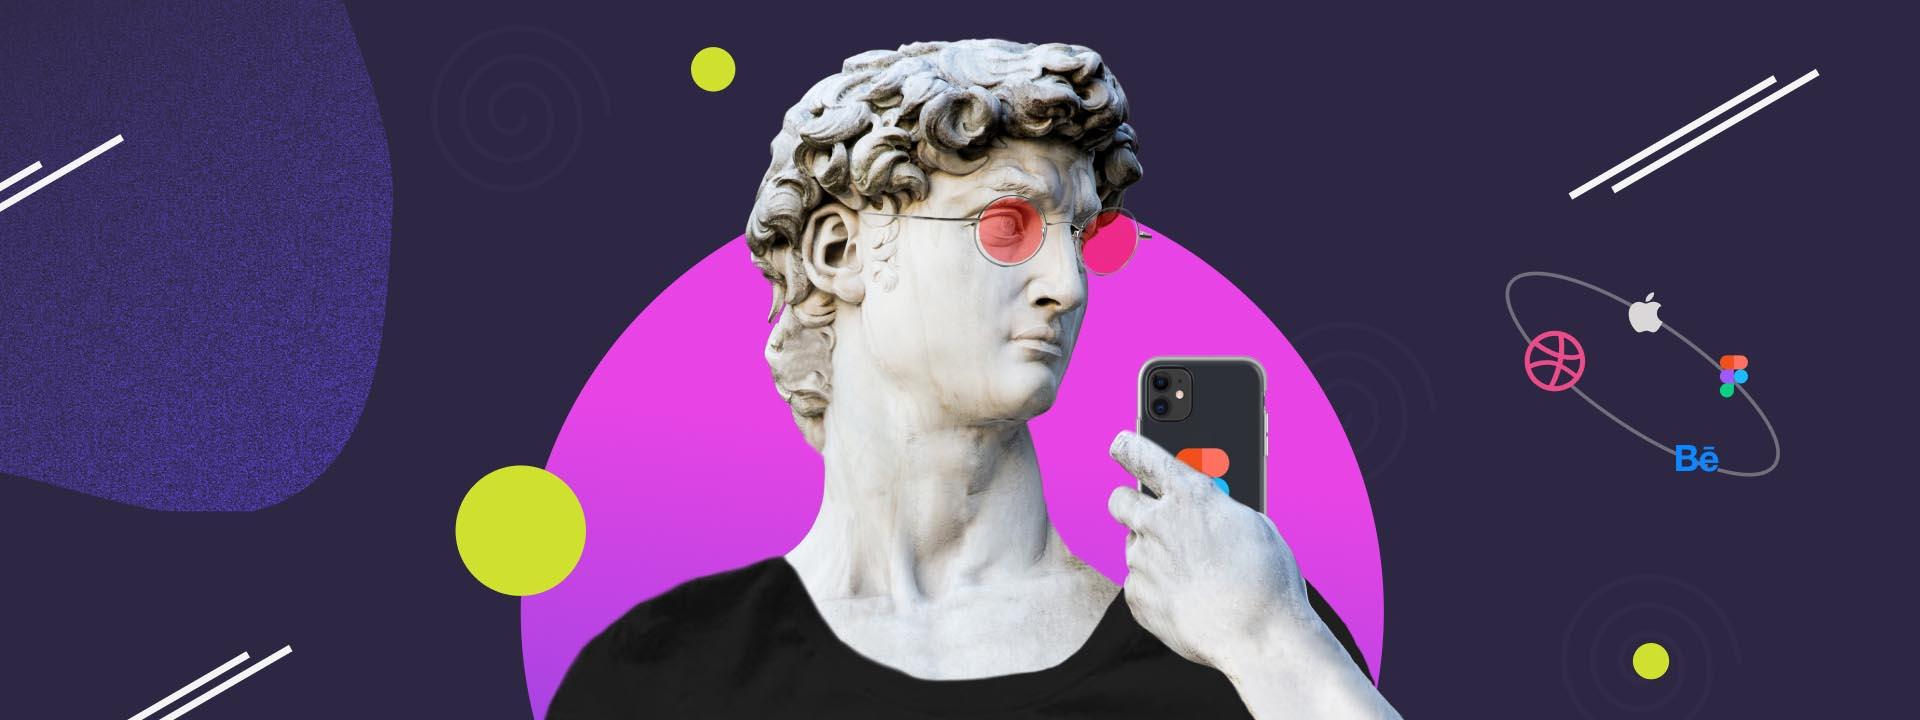 Shopping for Digital Designers